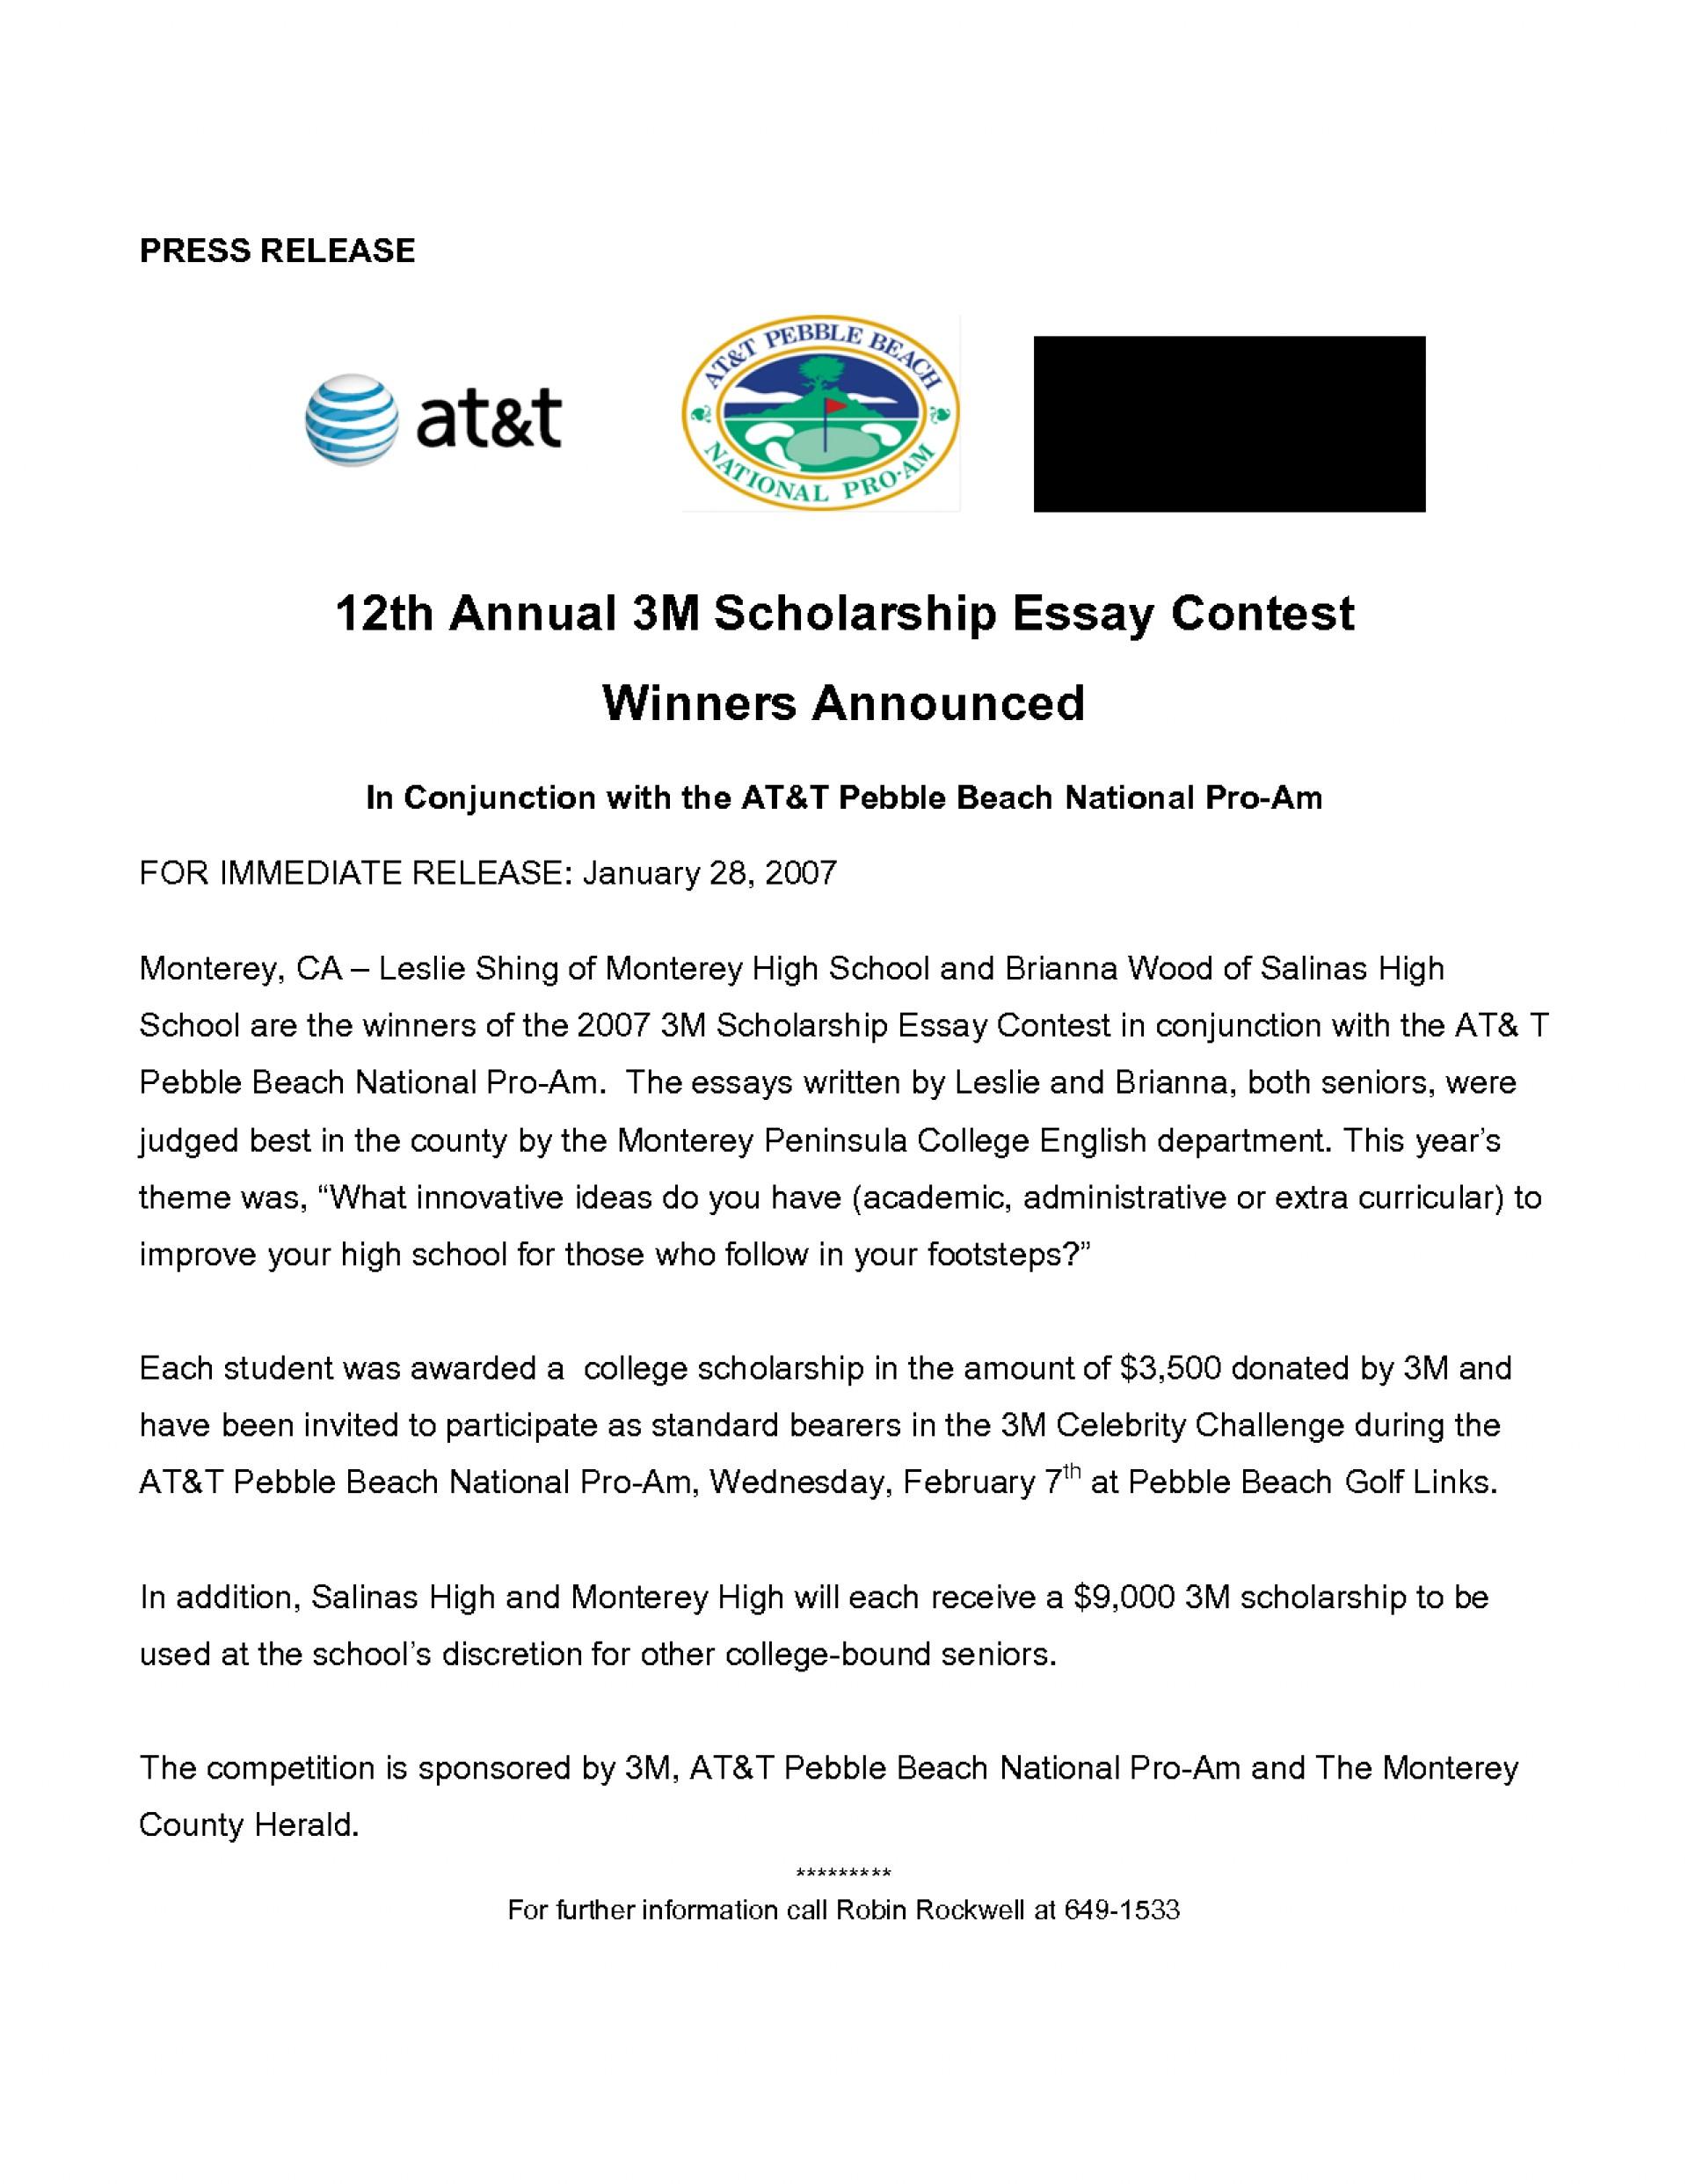 Canadian essay scholarships